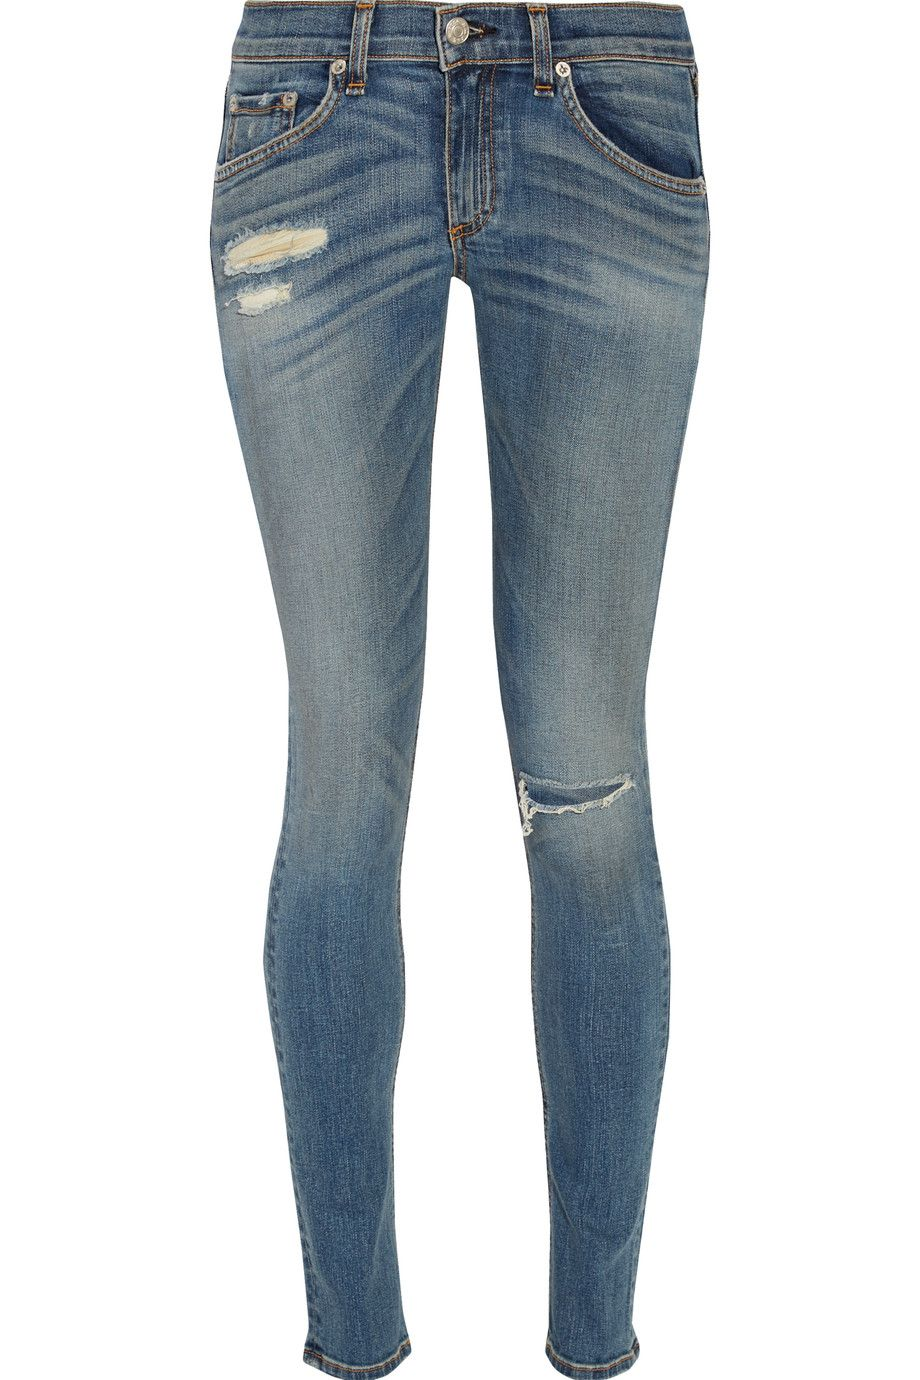 Rag & Bone Distressed mid-rise skinny jeans | Pretty Little Liars